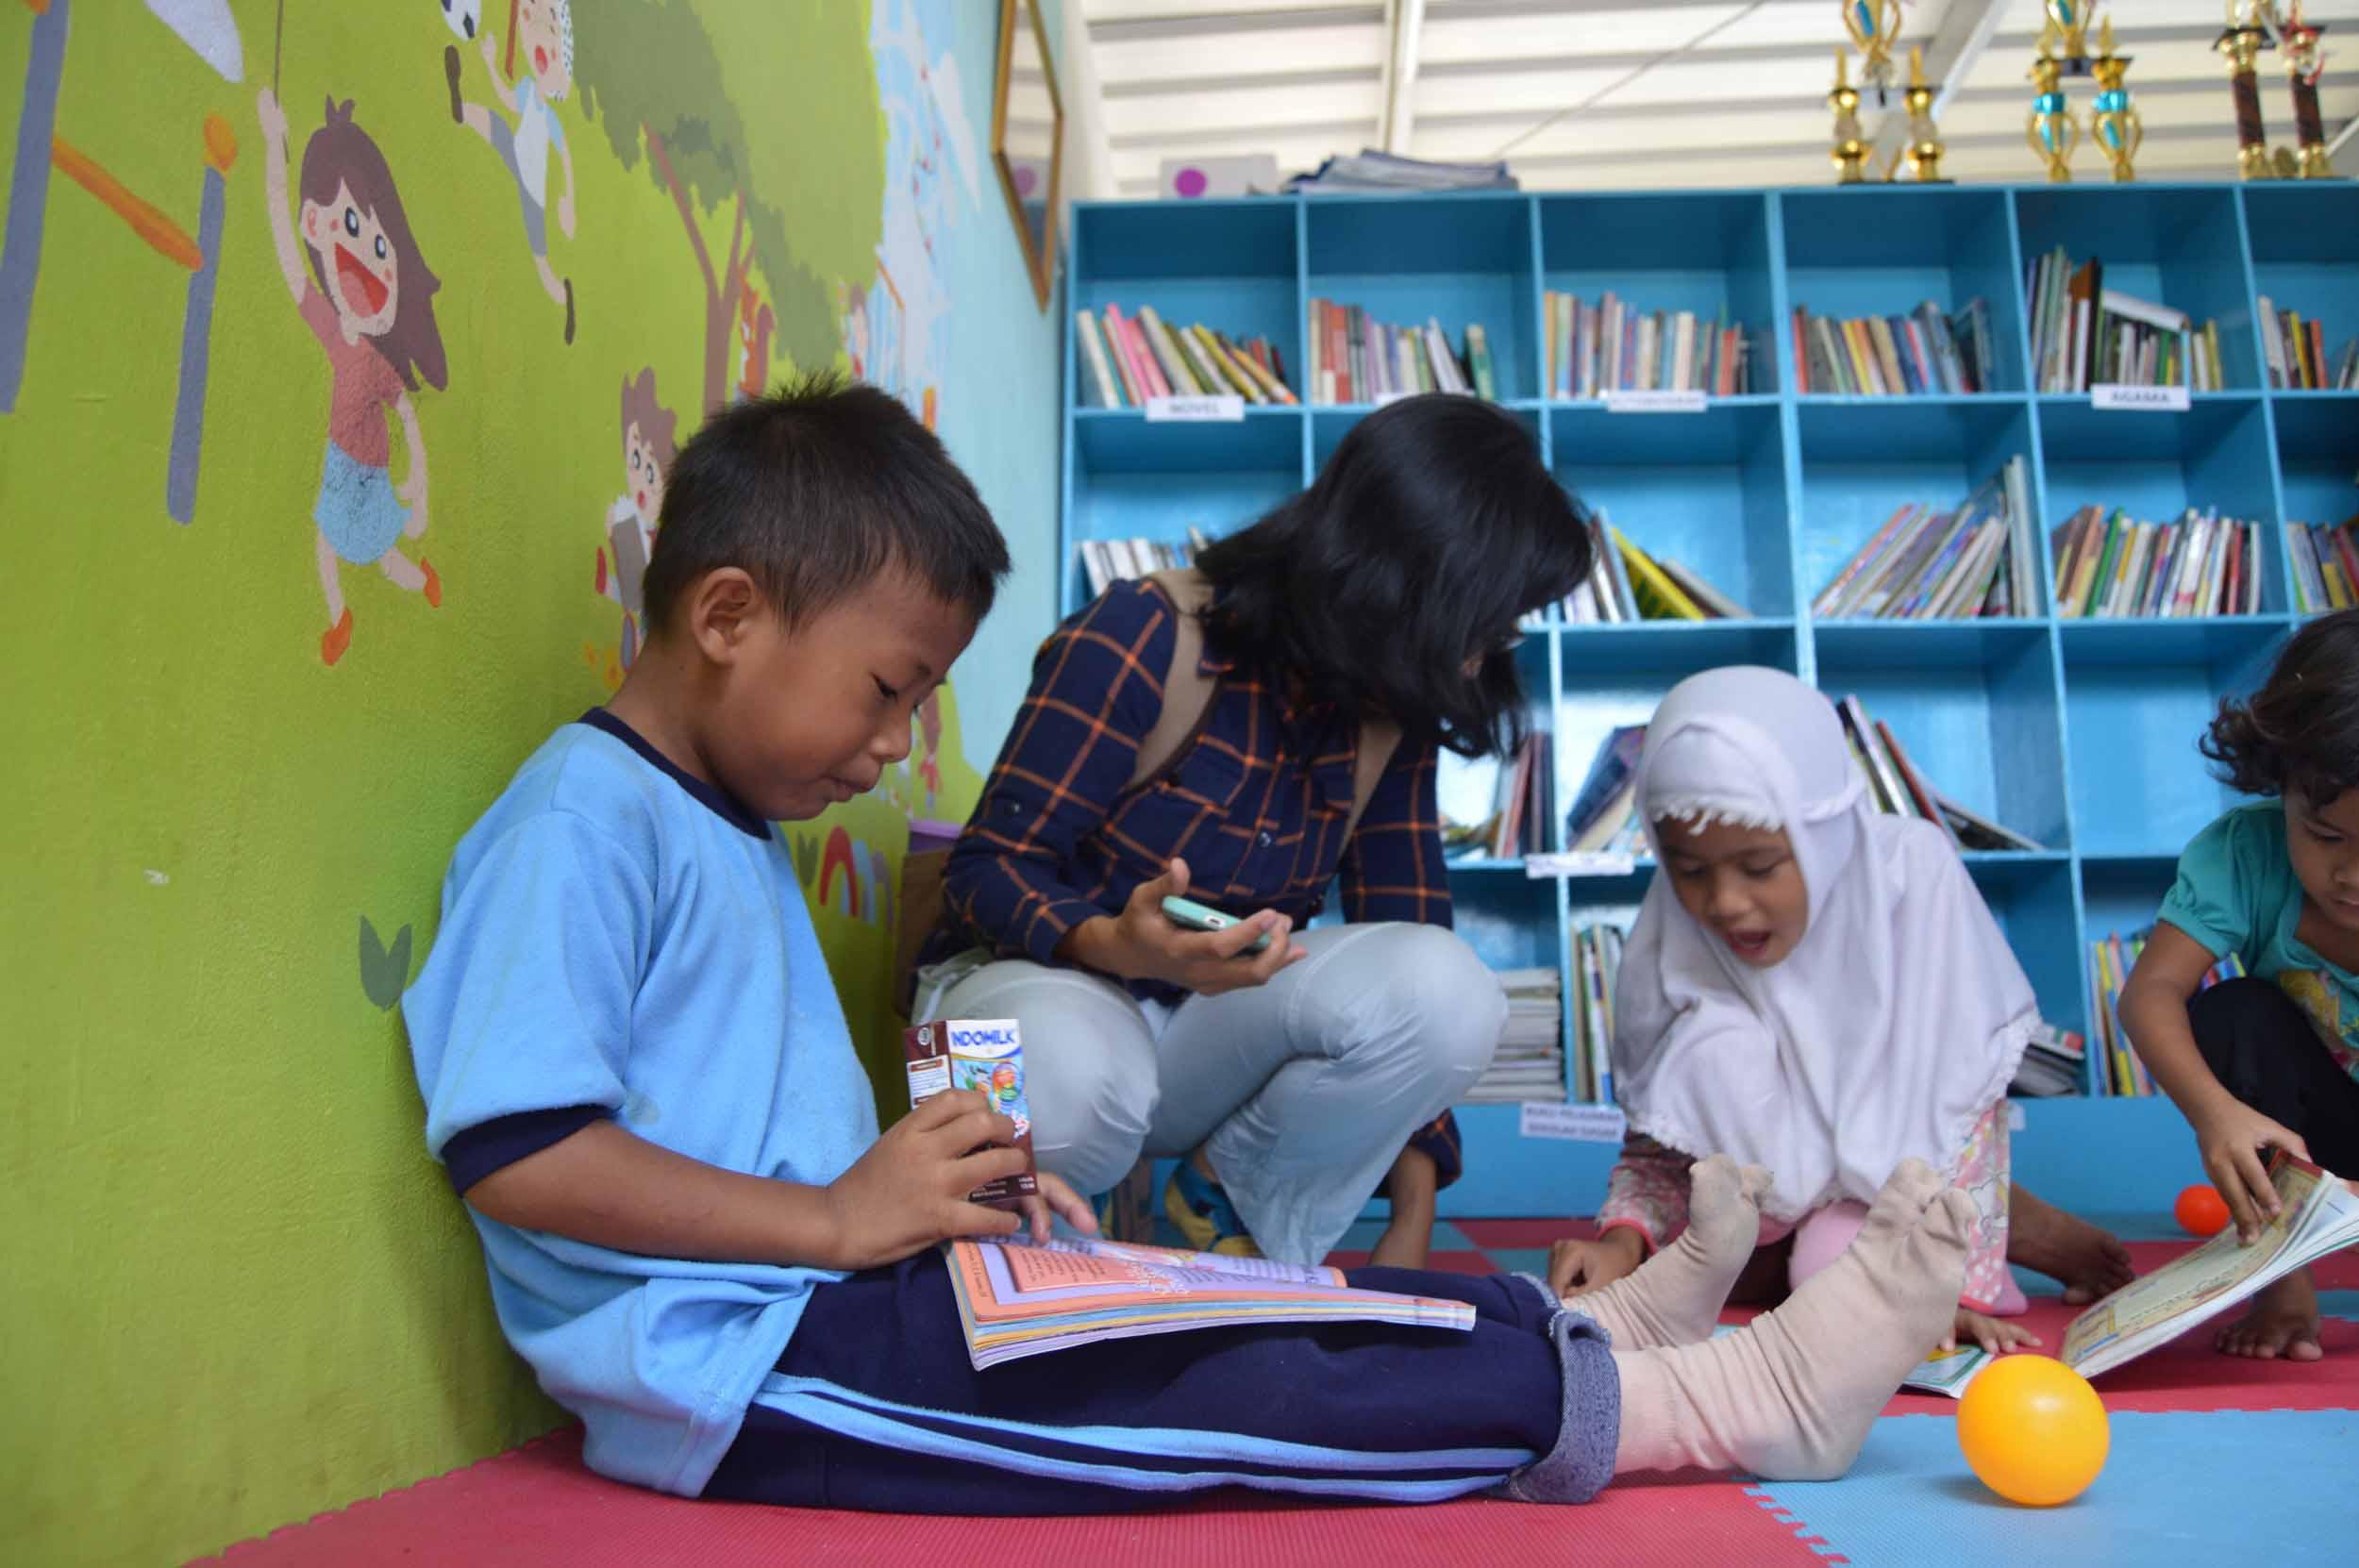 <a  style='text-decoration: none; font-weight:bold;' href=http://redwhitecommunication.com:80/index.php/_home/news/id/MTAw.php>Jiwasraya Renovasi Perpustakaan RPTRA Bahari Gandaria Selatan dan RPTRA Sungai Bambu</a>